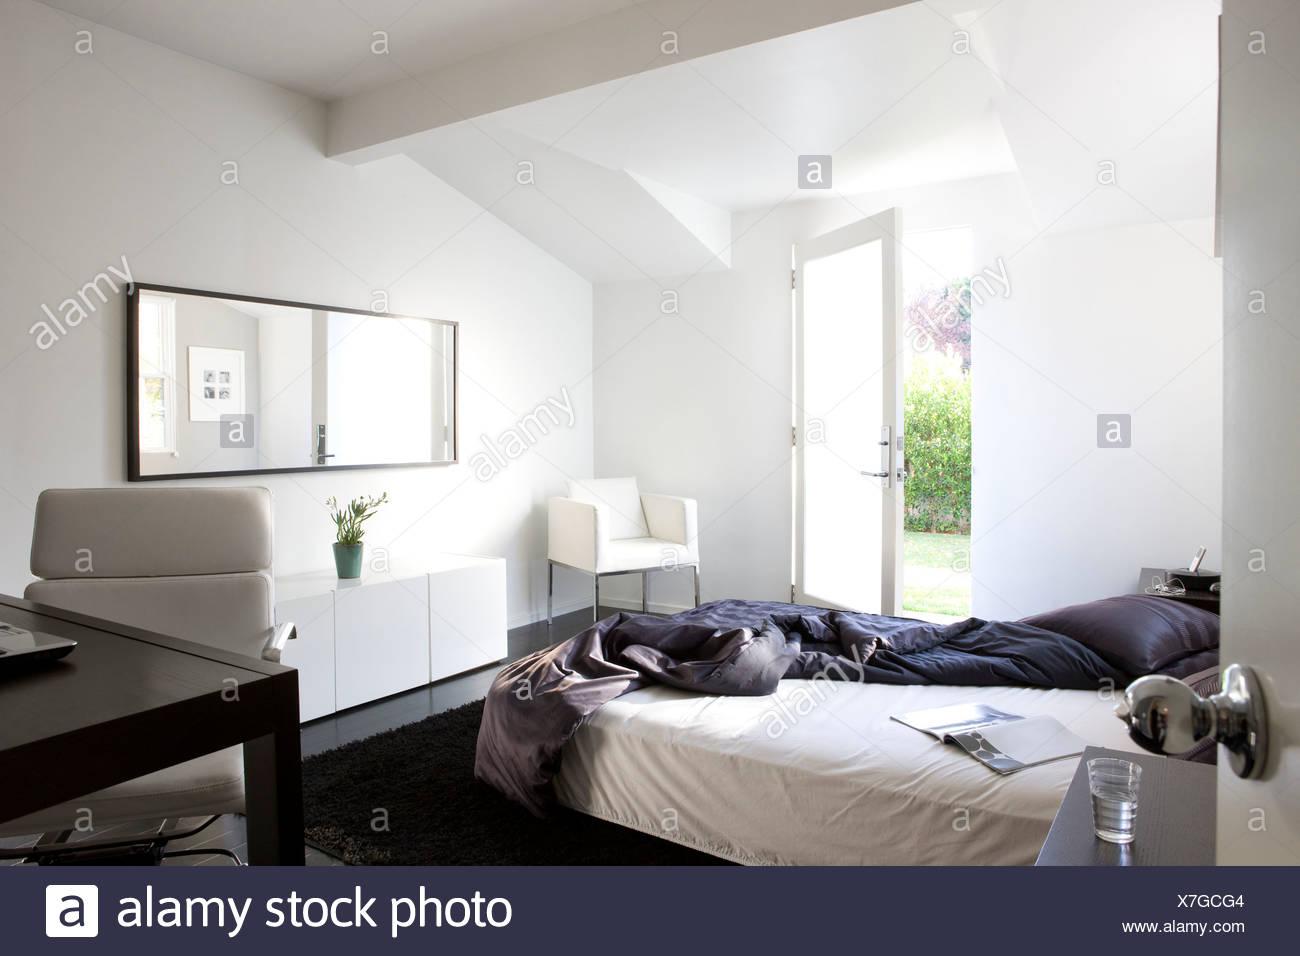 Messy modern bedroom Stock Photo: 280029572 - Alamy